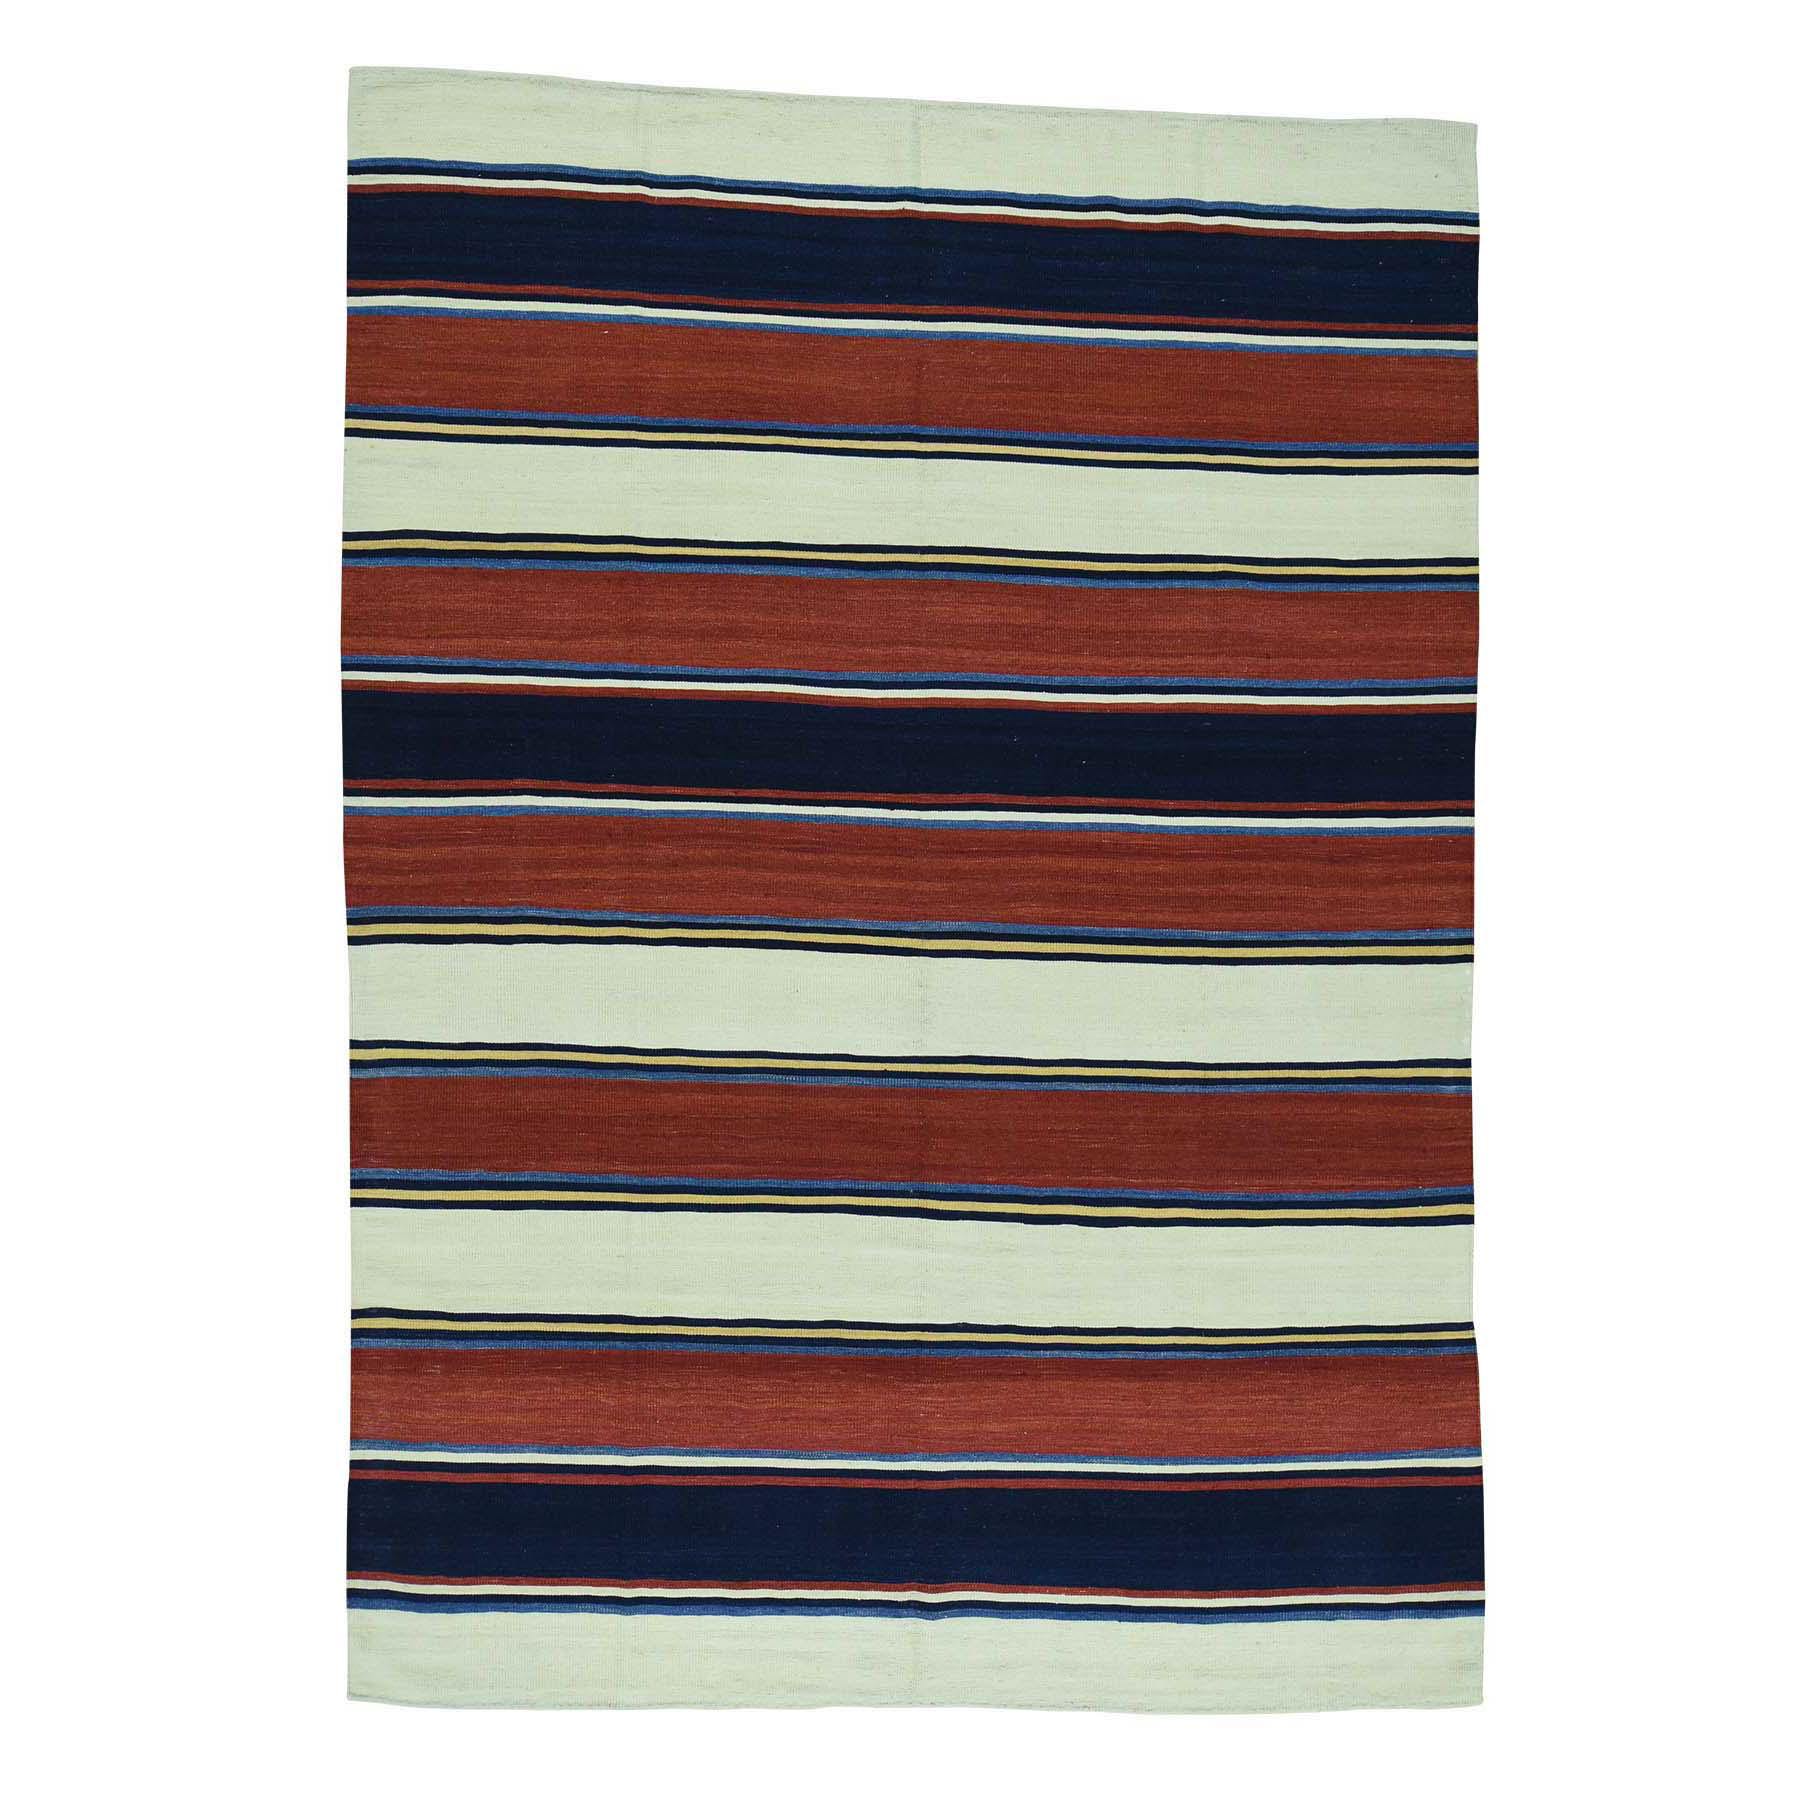 "6'5""X9' Hand Woven Flat Weave Striped Qashqai Kilim Oriental Rug moac6a60"